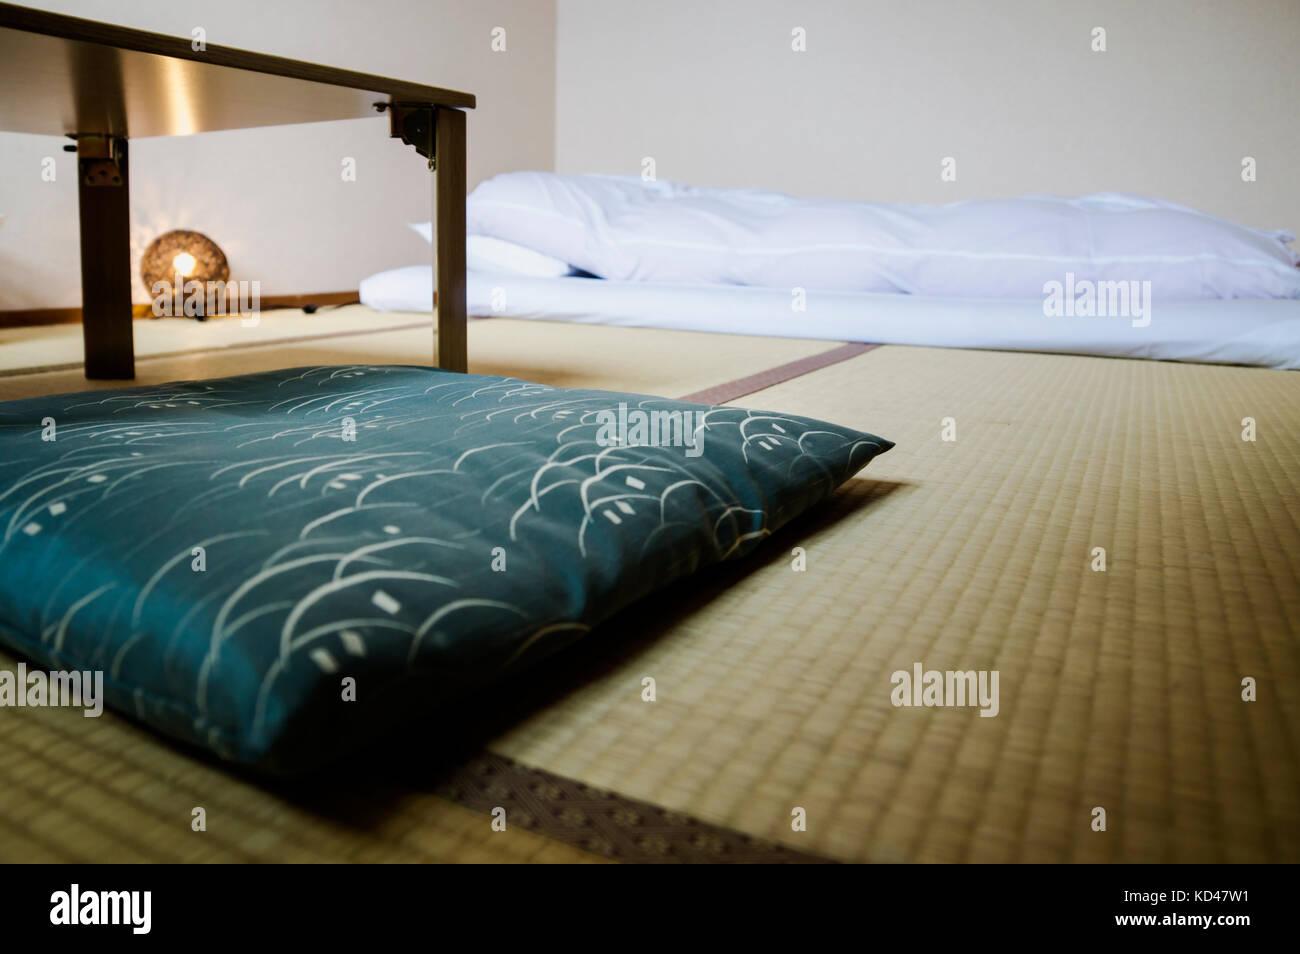 Traditional Japanese Ryokan Room With Tatimi Mats And Futon Japan